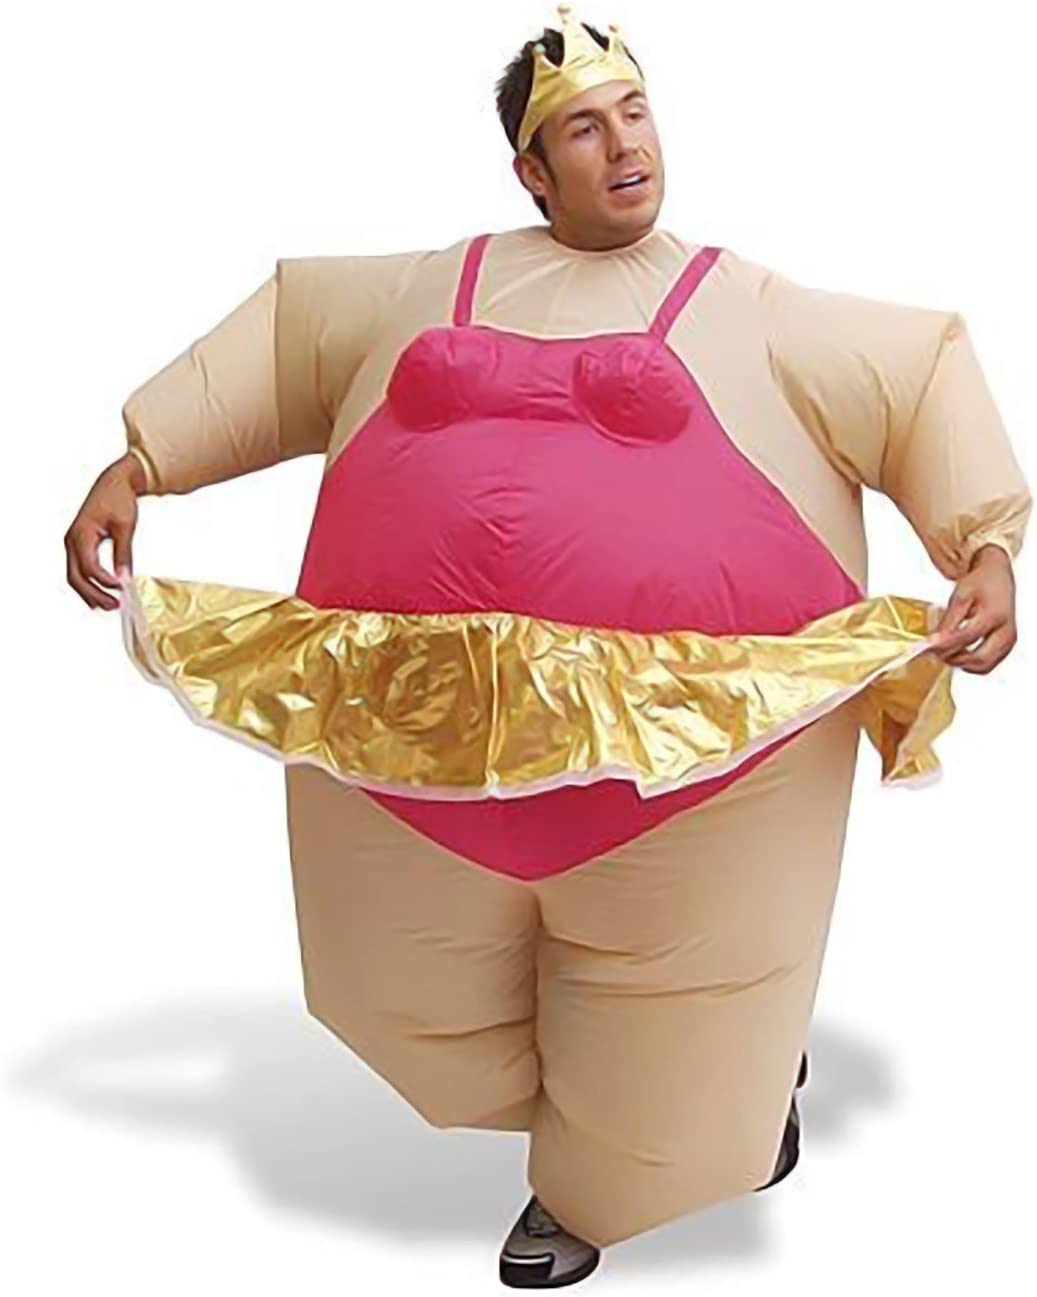 AirSuits Inflable Fatsuit Traje De La Bailarina Del Carnaval Disfraz Hinchable De Bailarina Para Carnaval